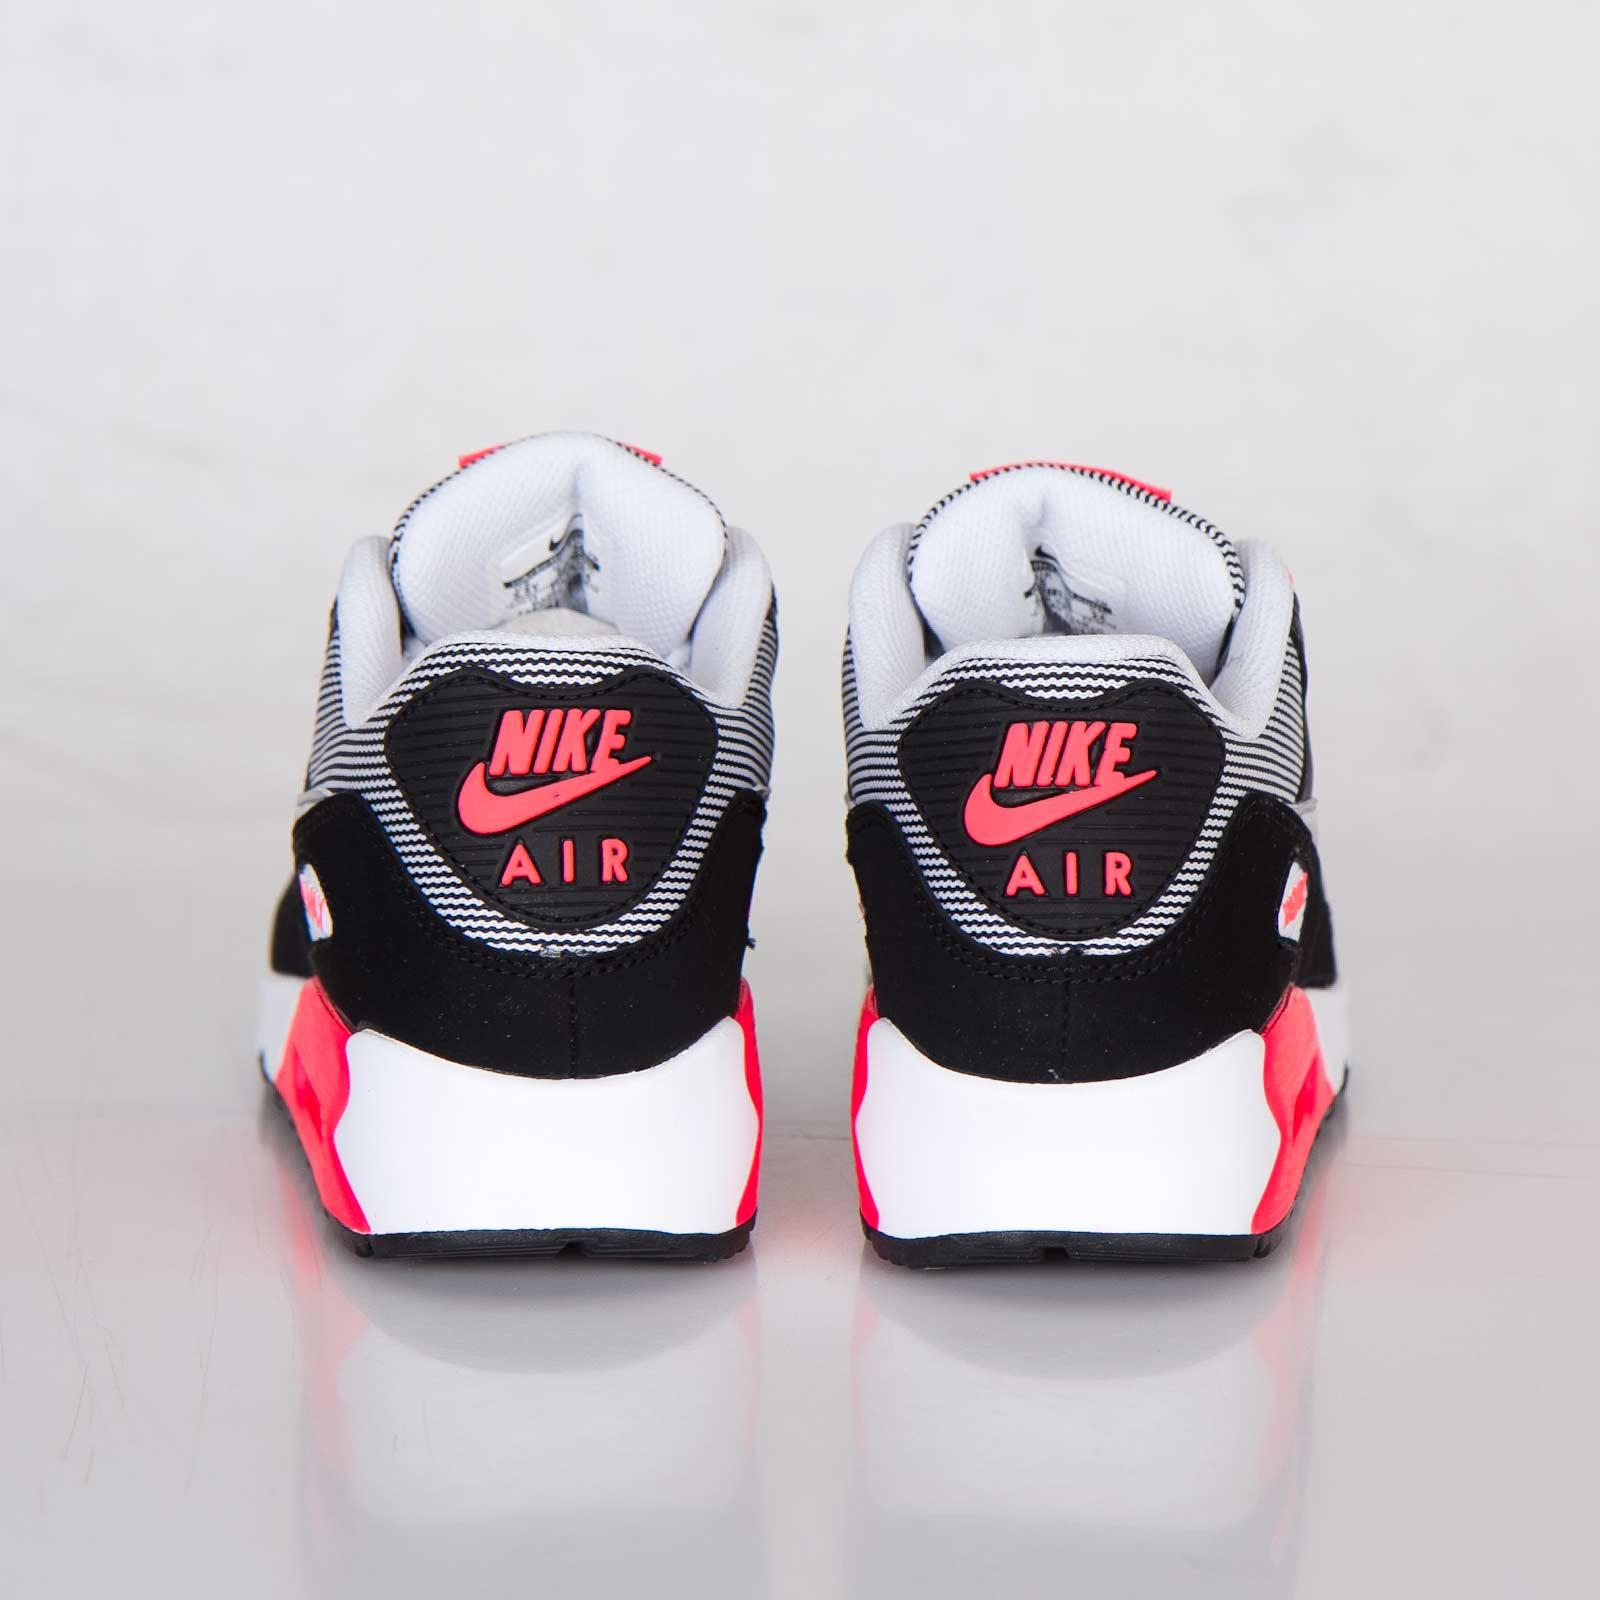 new styles 2e711 34d73 Nike Air Max 90 LE (GS) - 631381-100 - Sneakersnstuff   sneakers    streetwear online since 1999